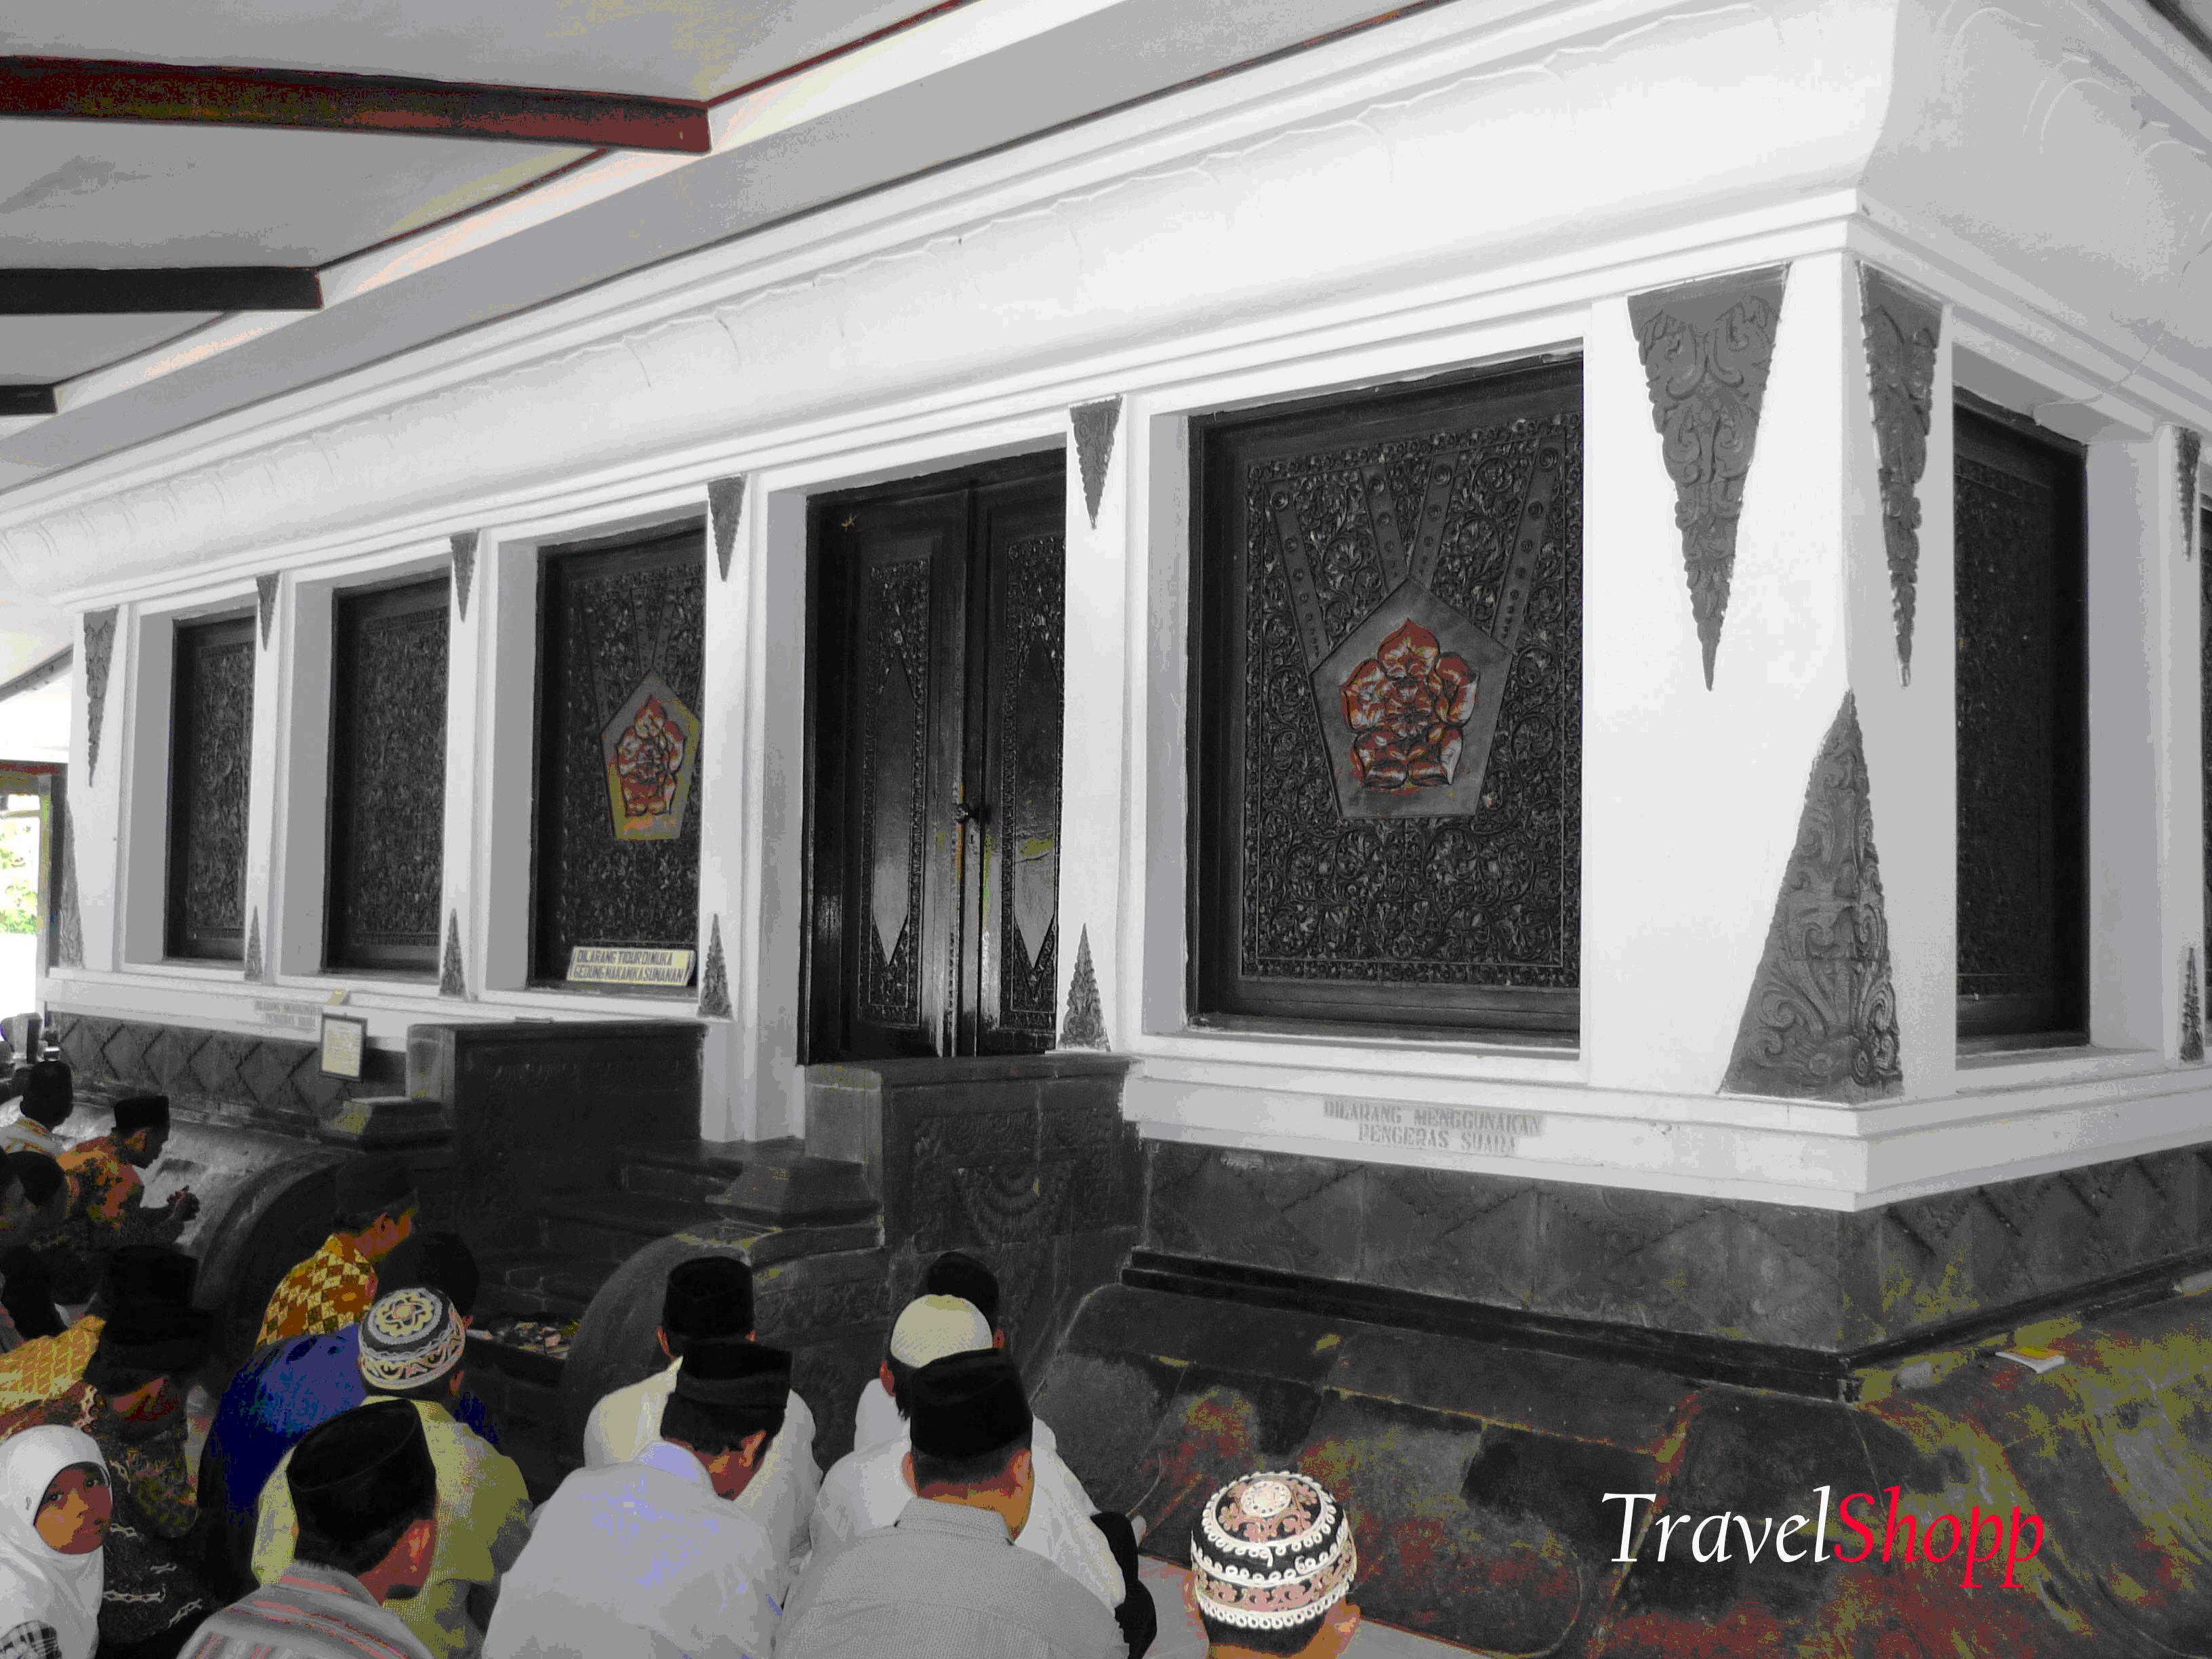 Studi Disain Makam Penyebar Agama Islam Artikeltulisan Sunan Giri Petilasan